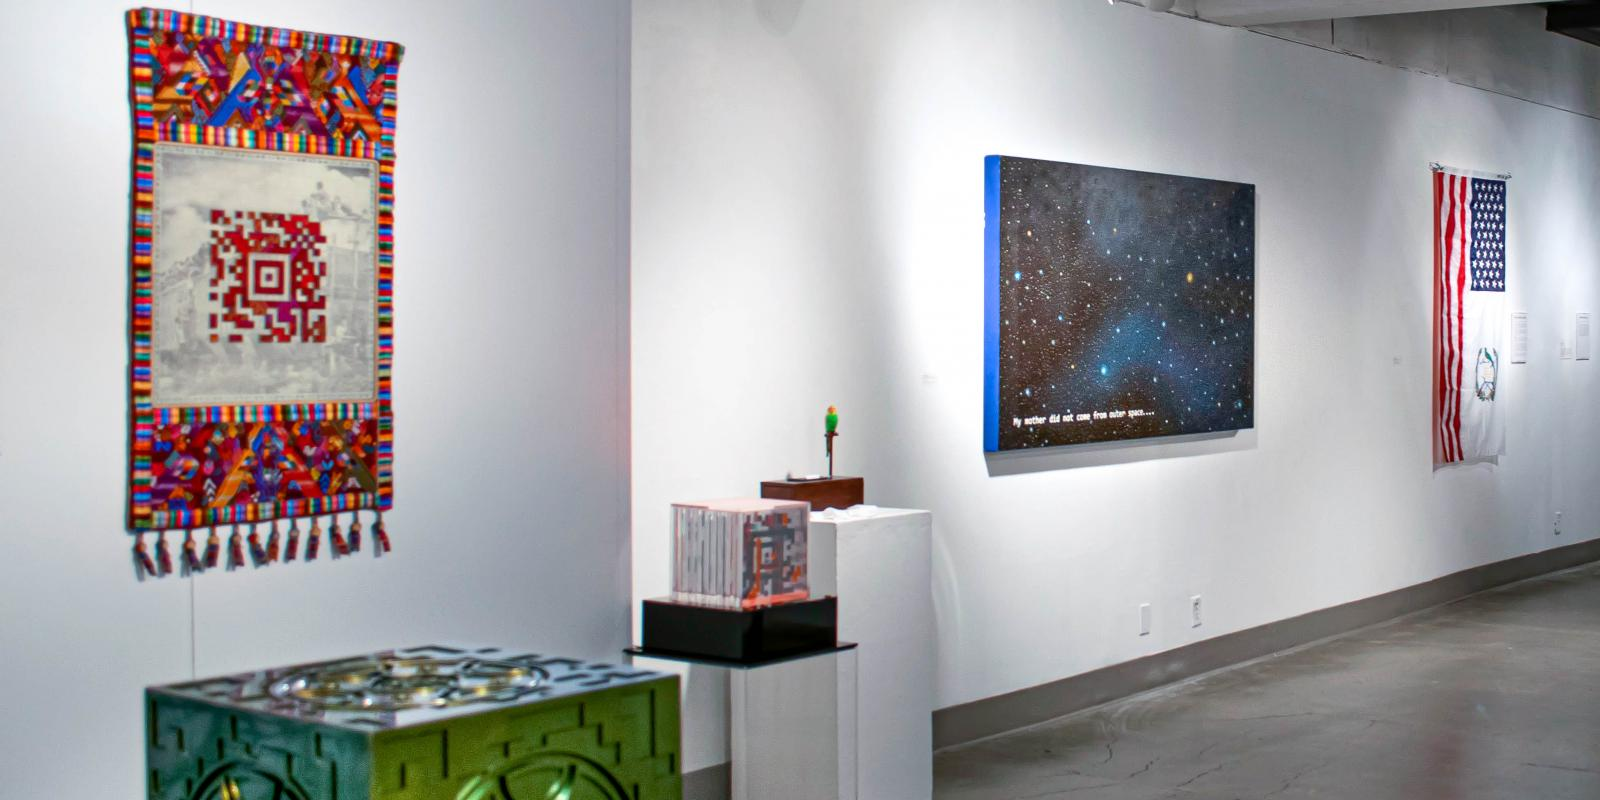 Somewhere in Between - 2018/2019 Exhibition